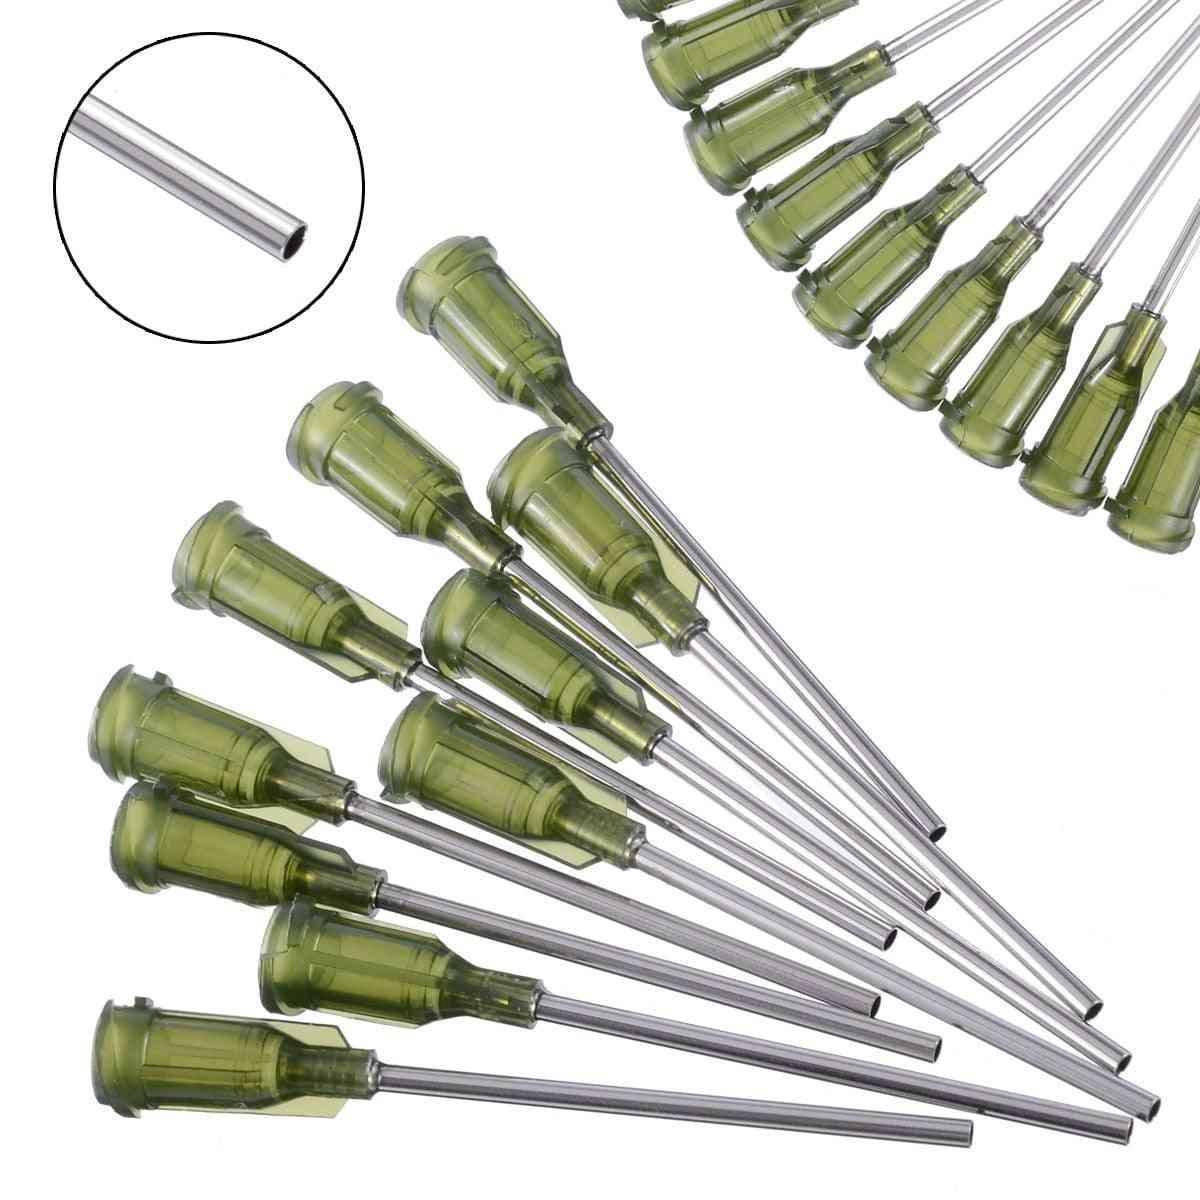 Dispensing Needles Syringe Tip Needle